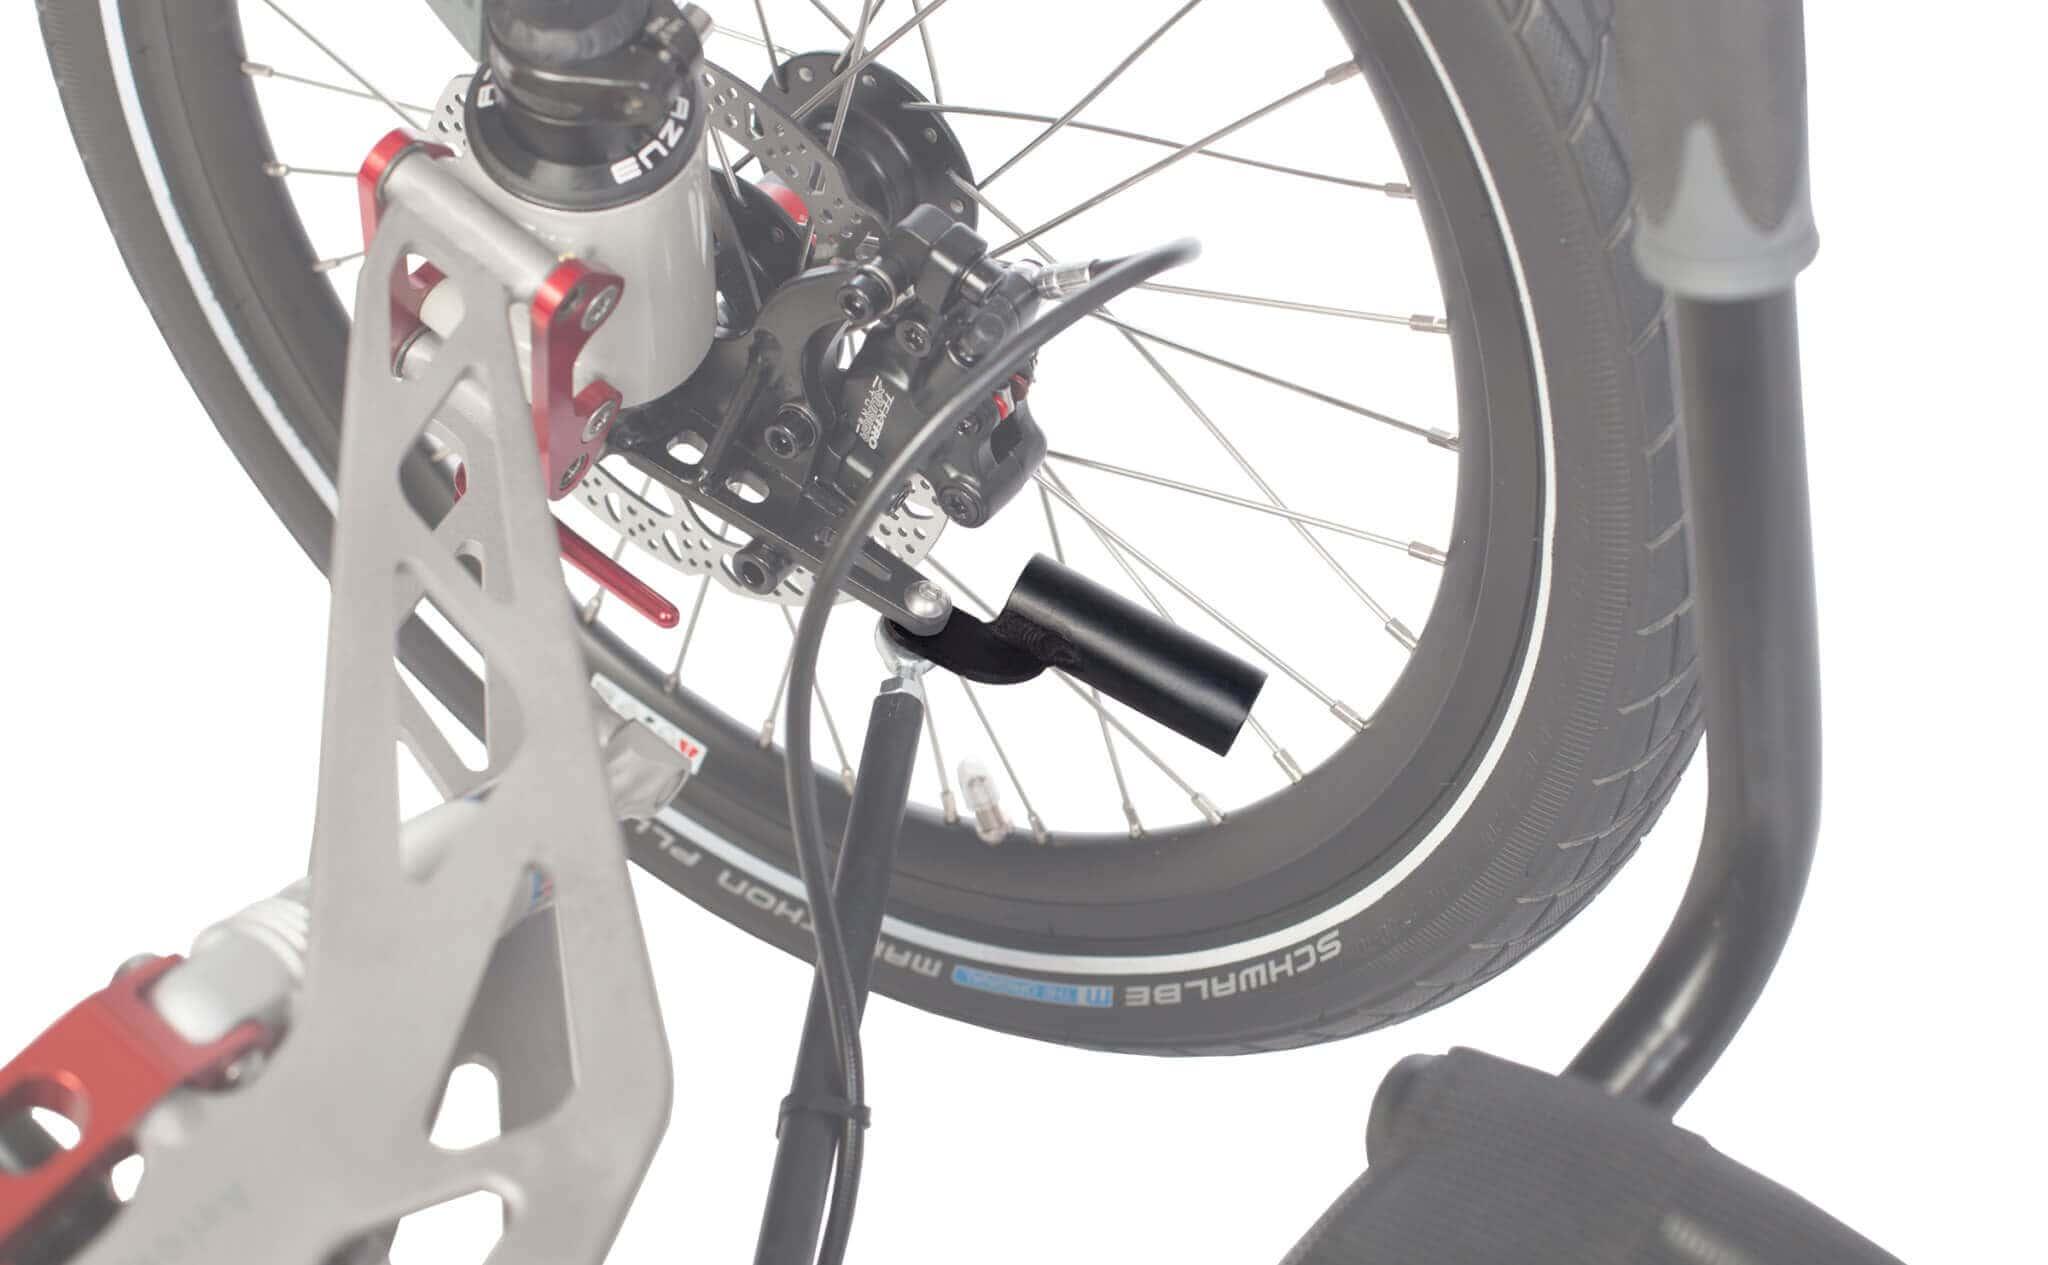 computer-sensor-mount-for-azub-trikes-drzak-senzoru-cyklo-pocitace-pro-trikolky-azub-on-trike